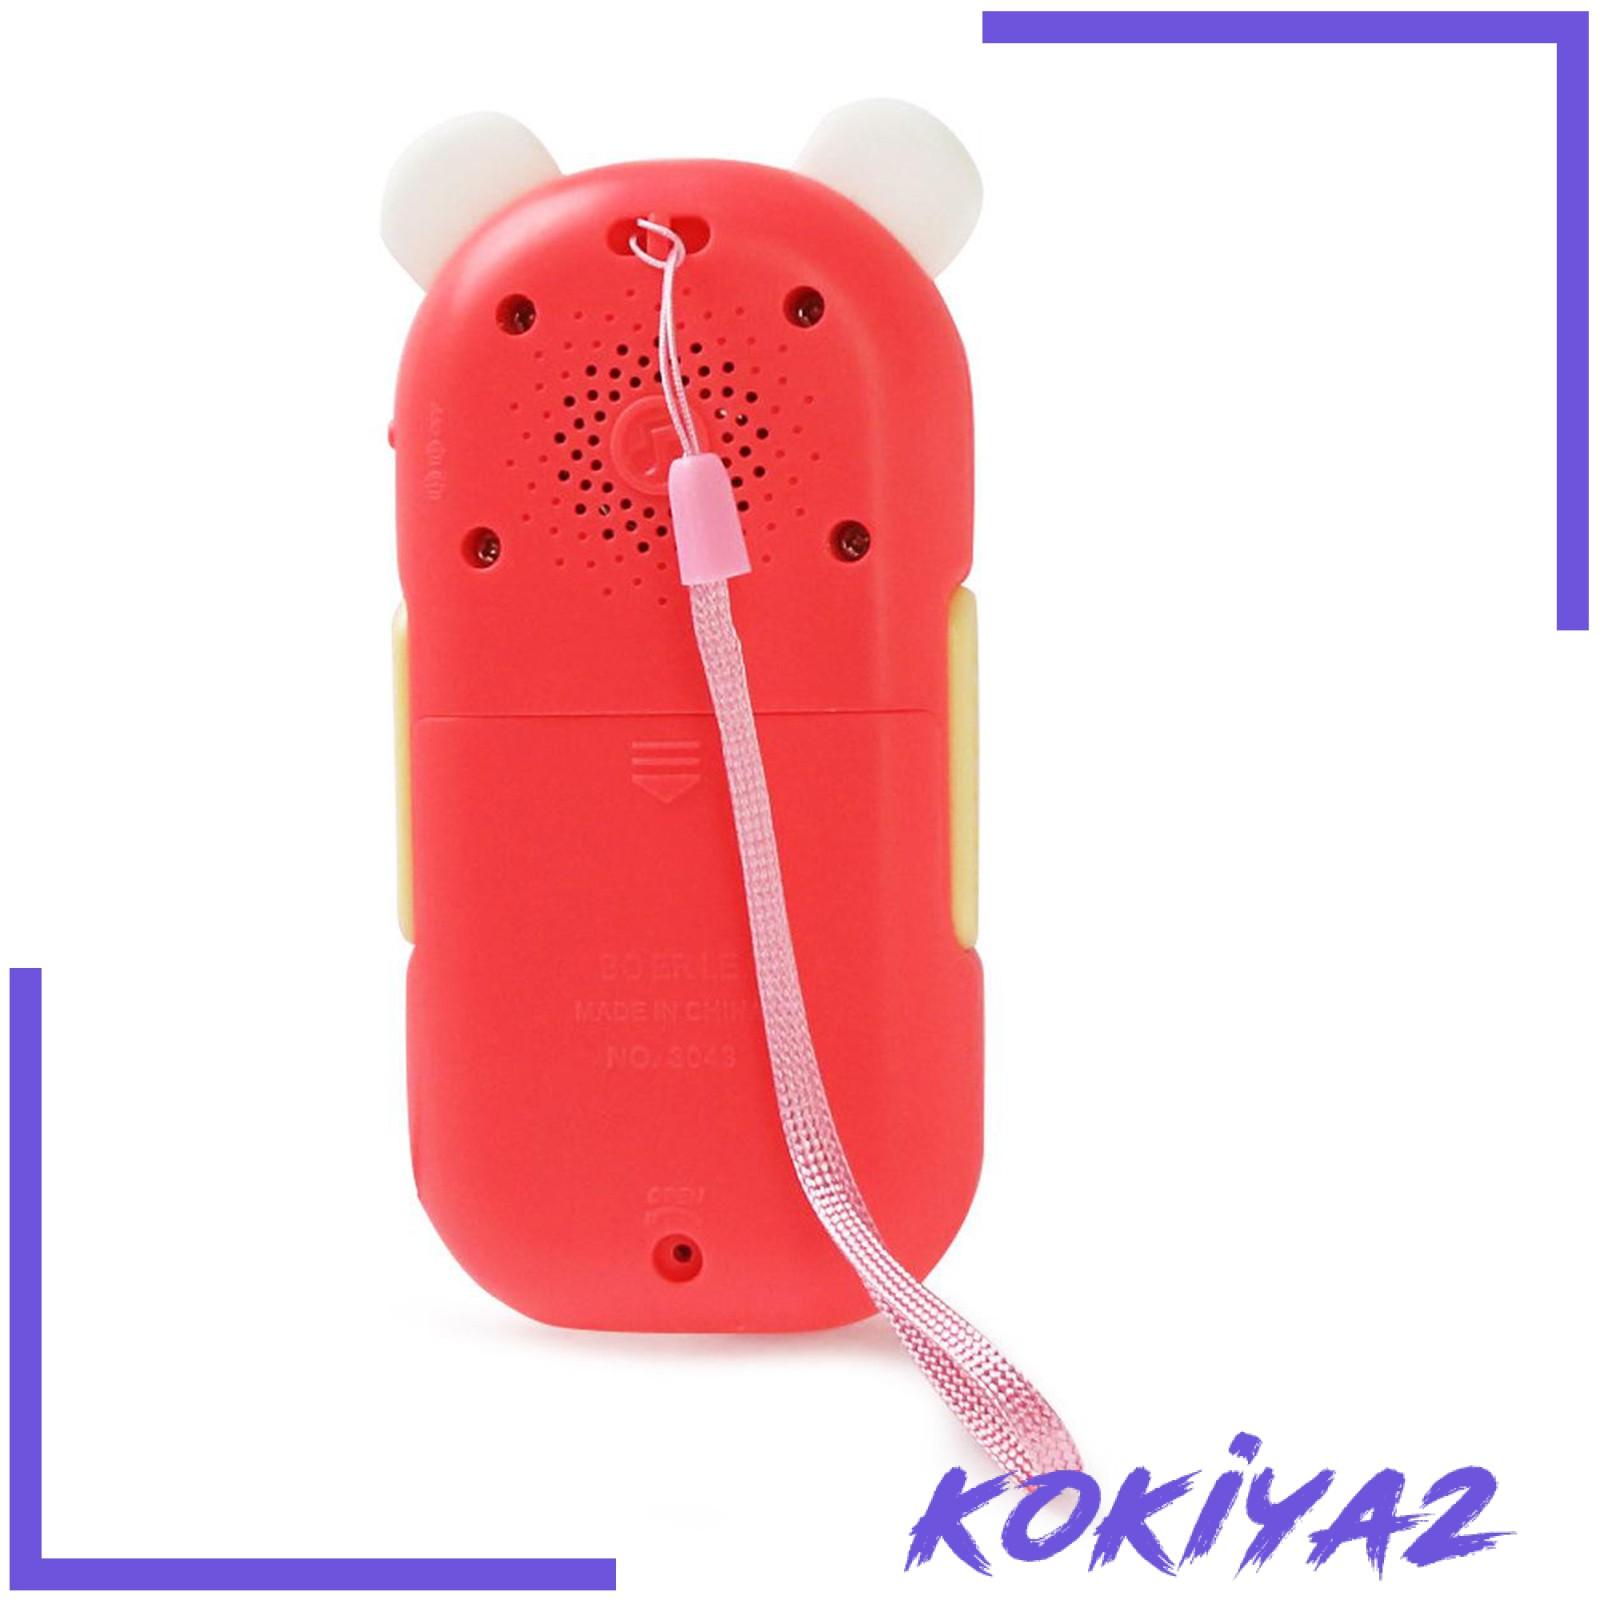 [KOKIYA2] Baby Colorful Music Mobile Phone Toys Electric Early Learning Educational Toys